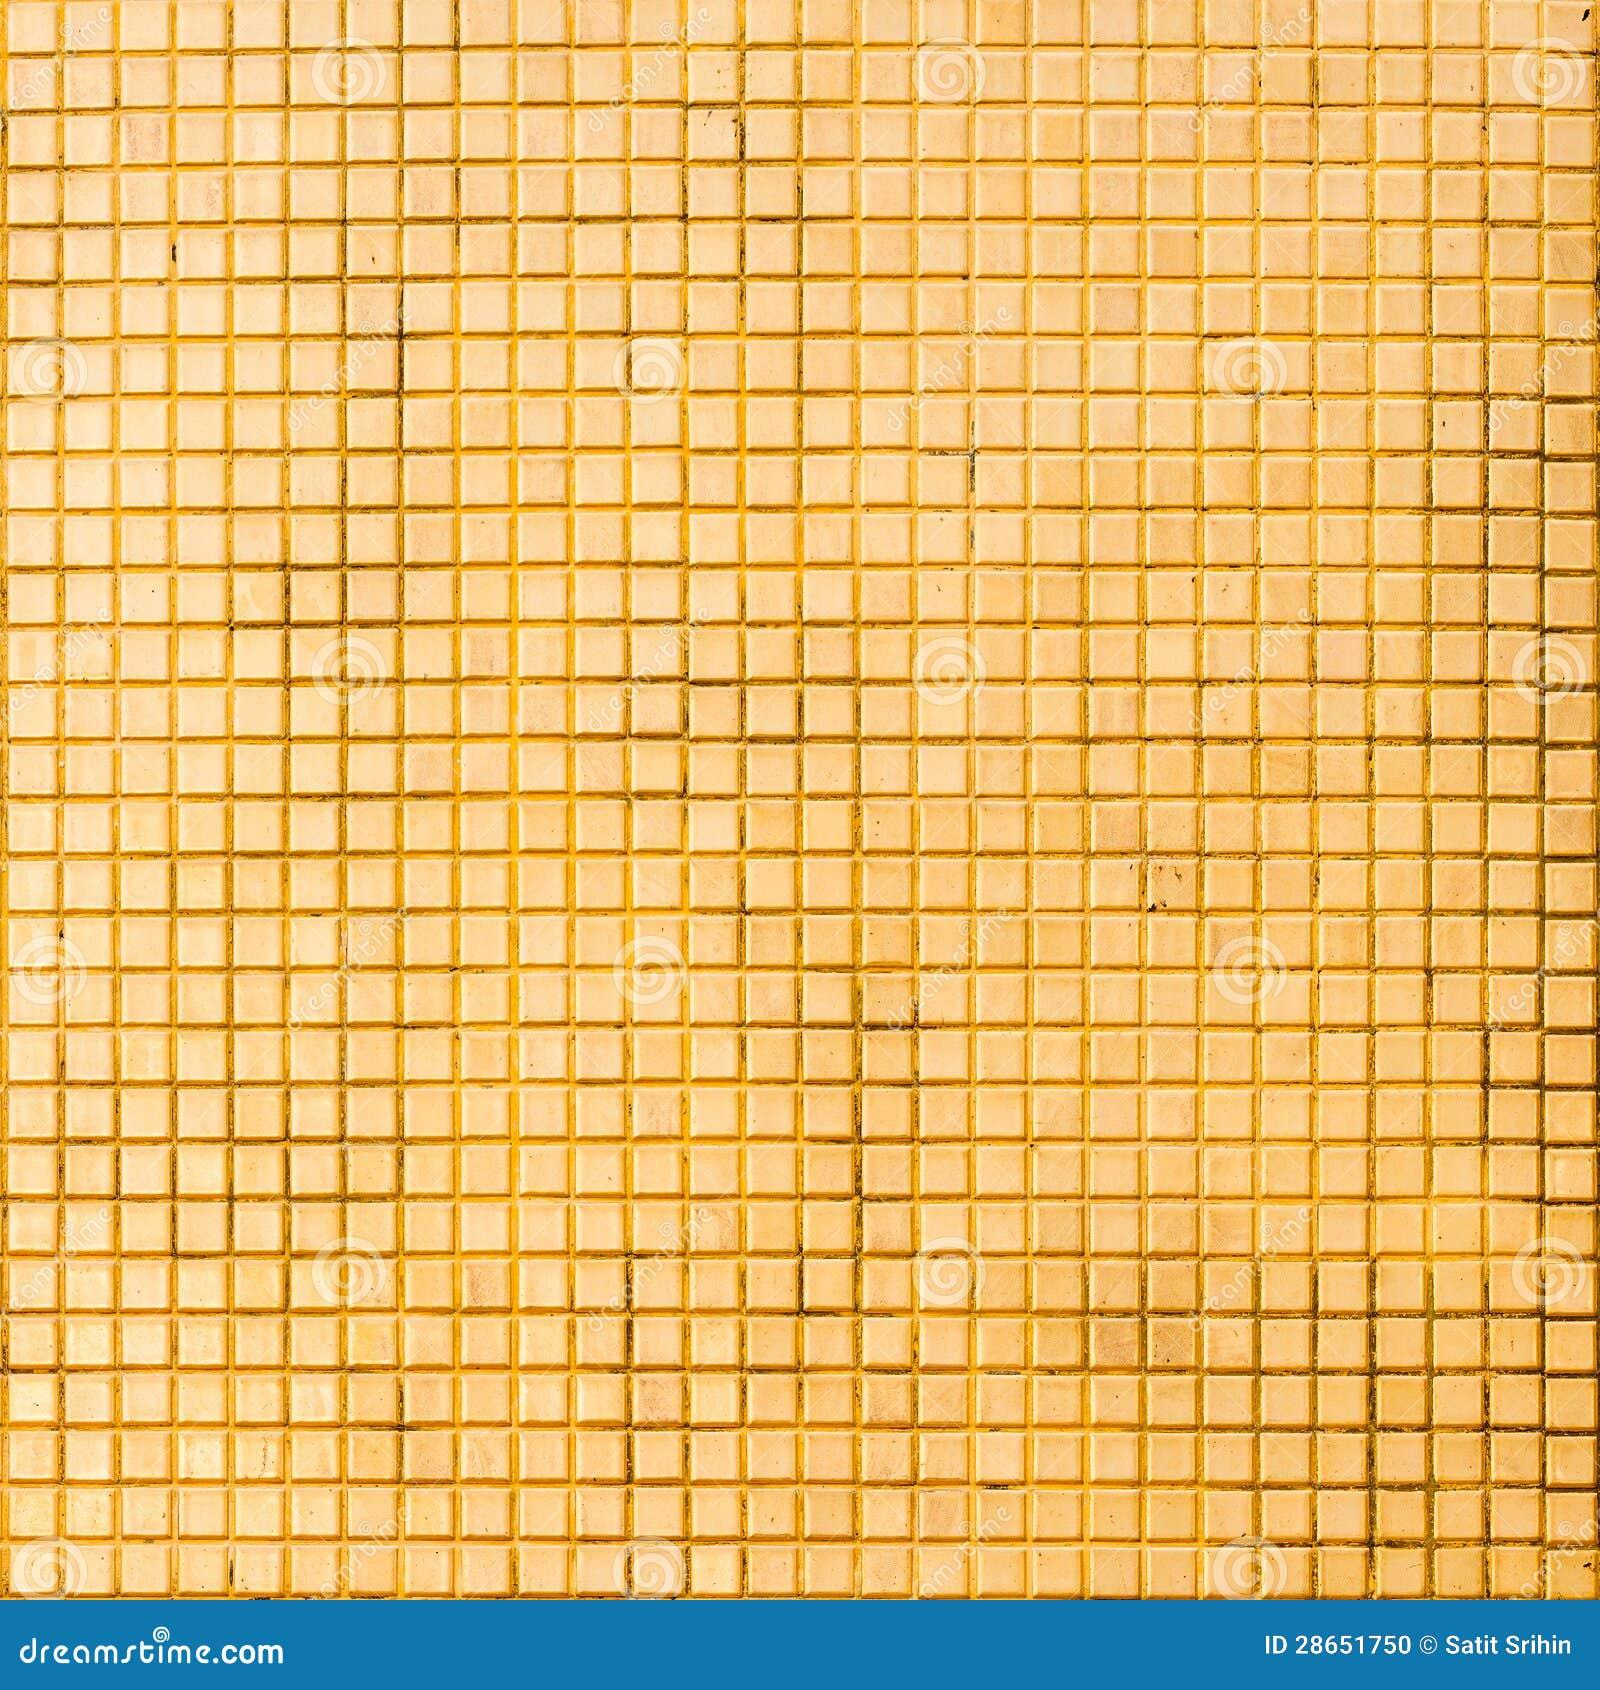 Grunge Golden Mosaic Tiles Texture Stock Photo Image